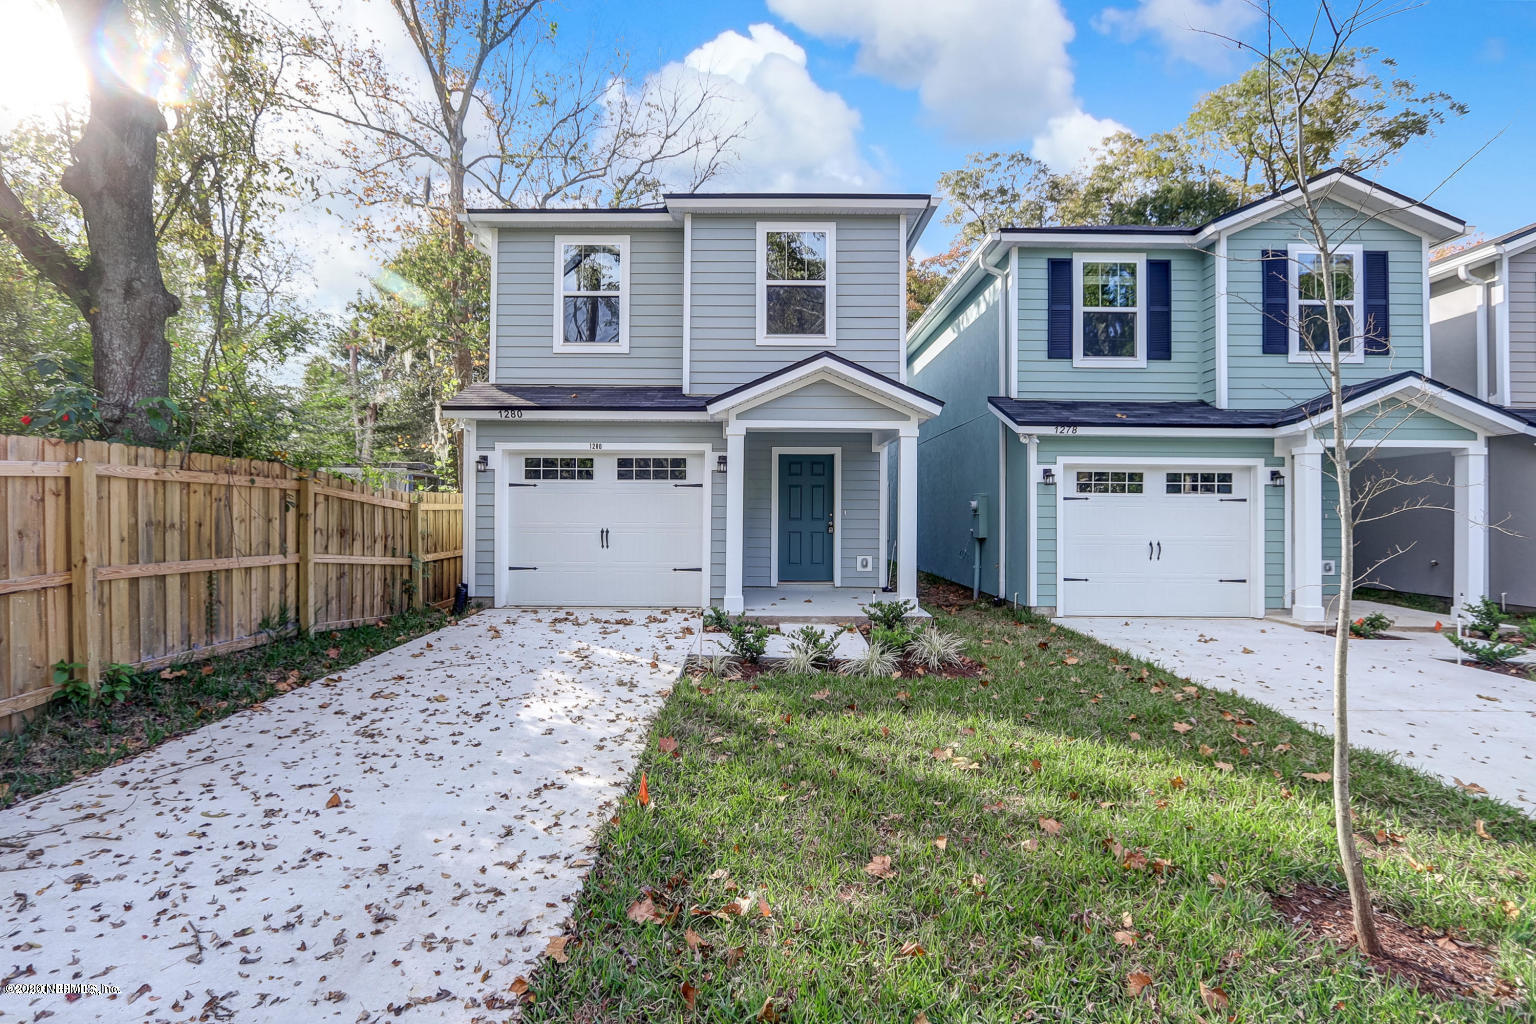 1312 Lake Shore Blvd Jacksonville, FL 32205